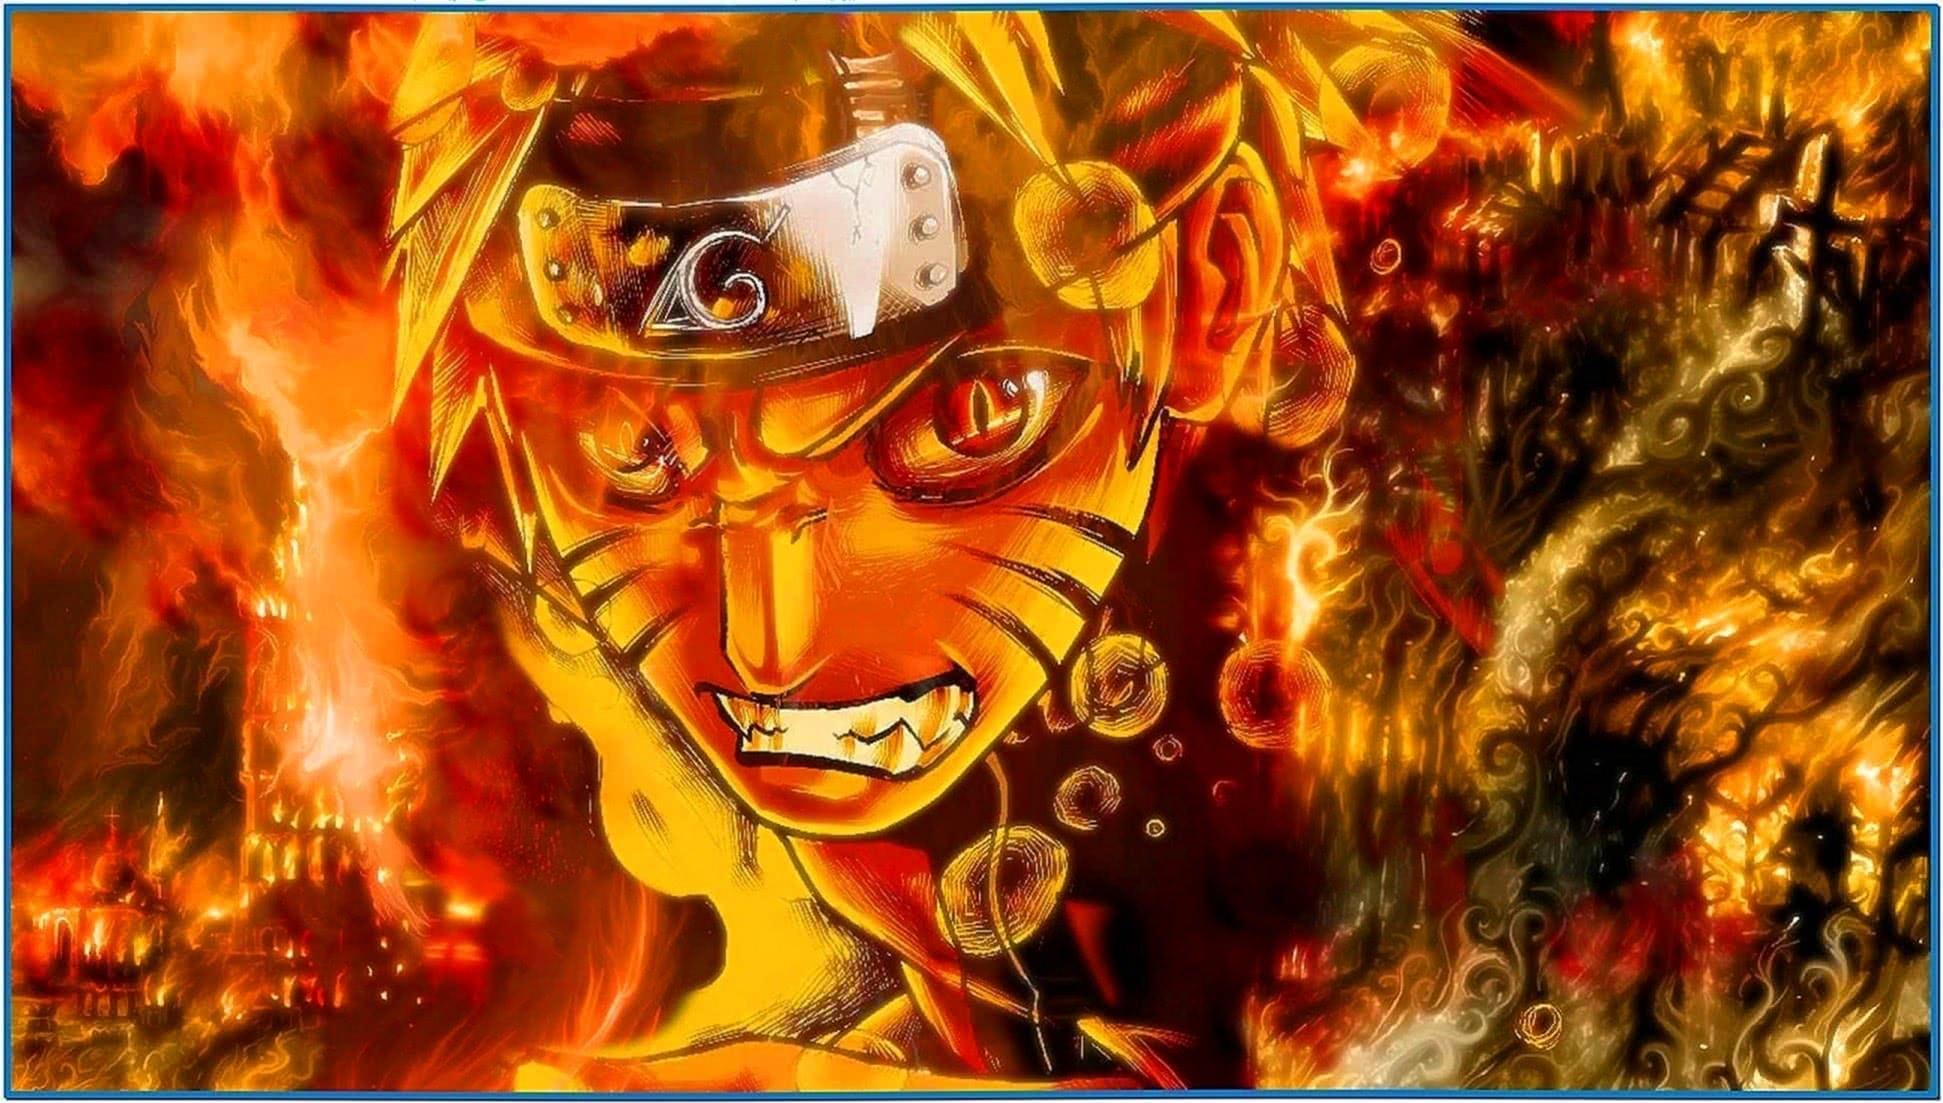 Naruto Screensaver for PC